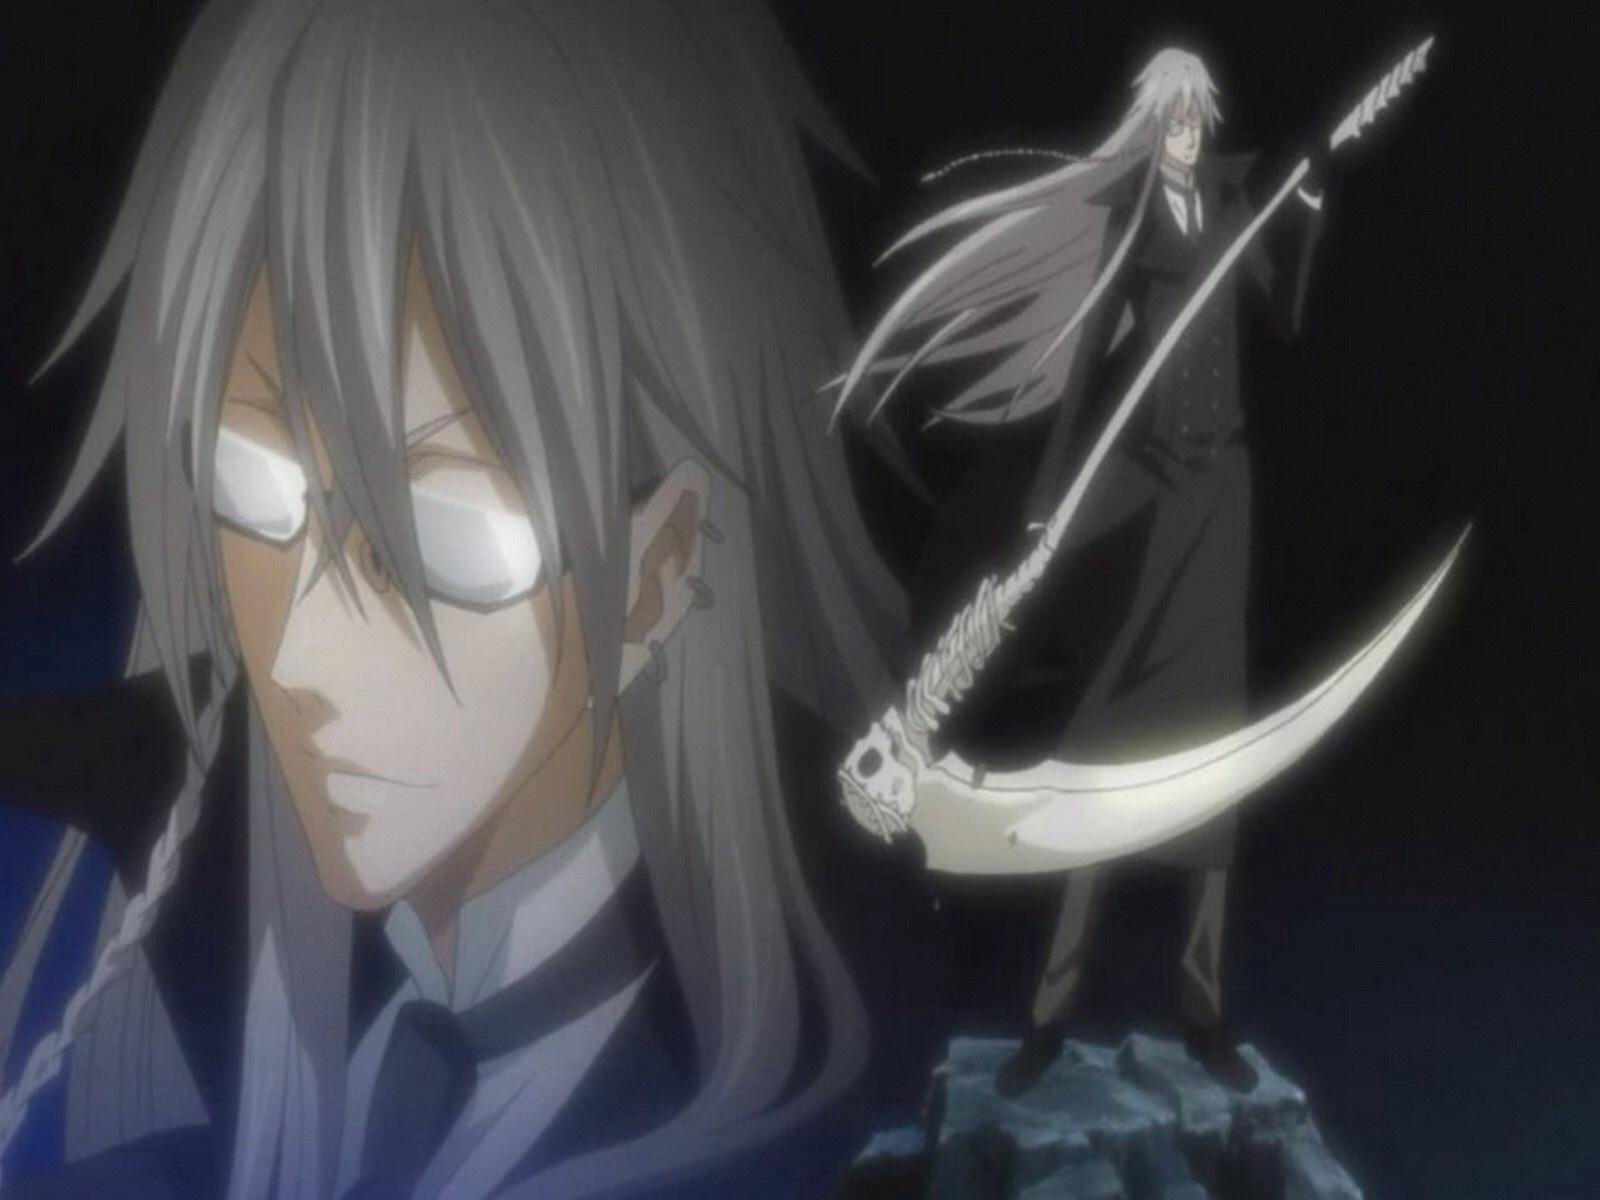 reaper anime wallpaper - photo #47